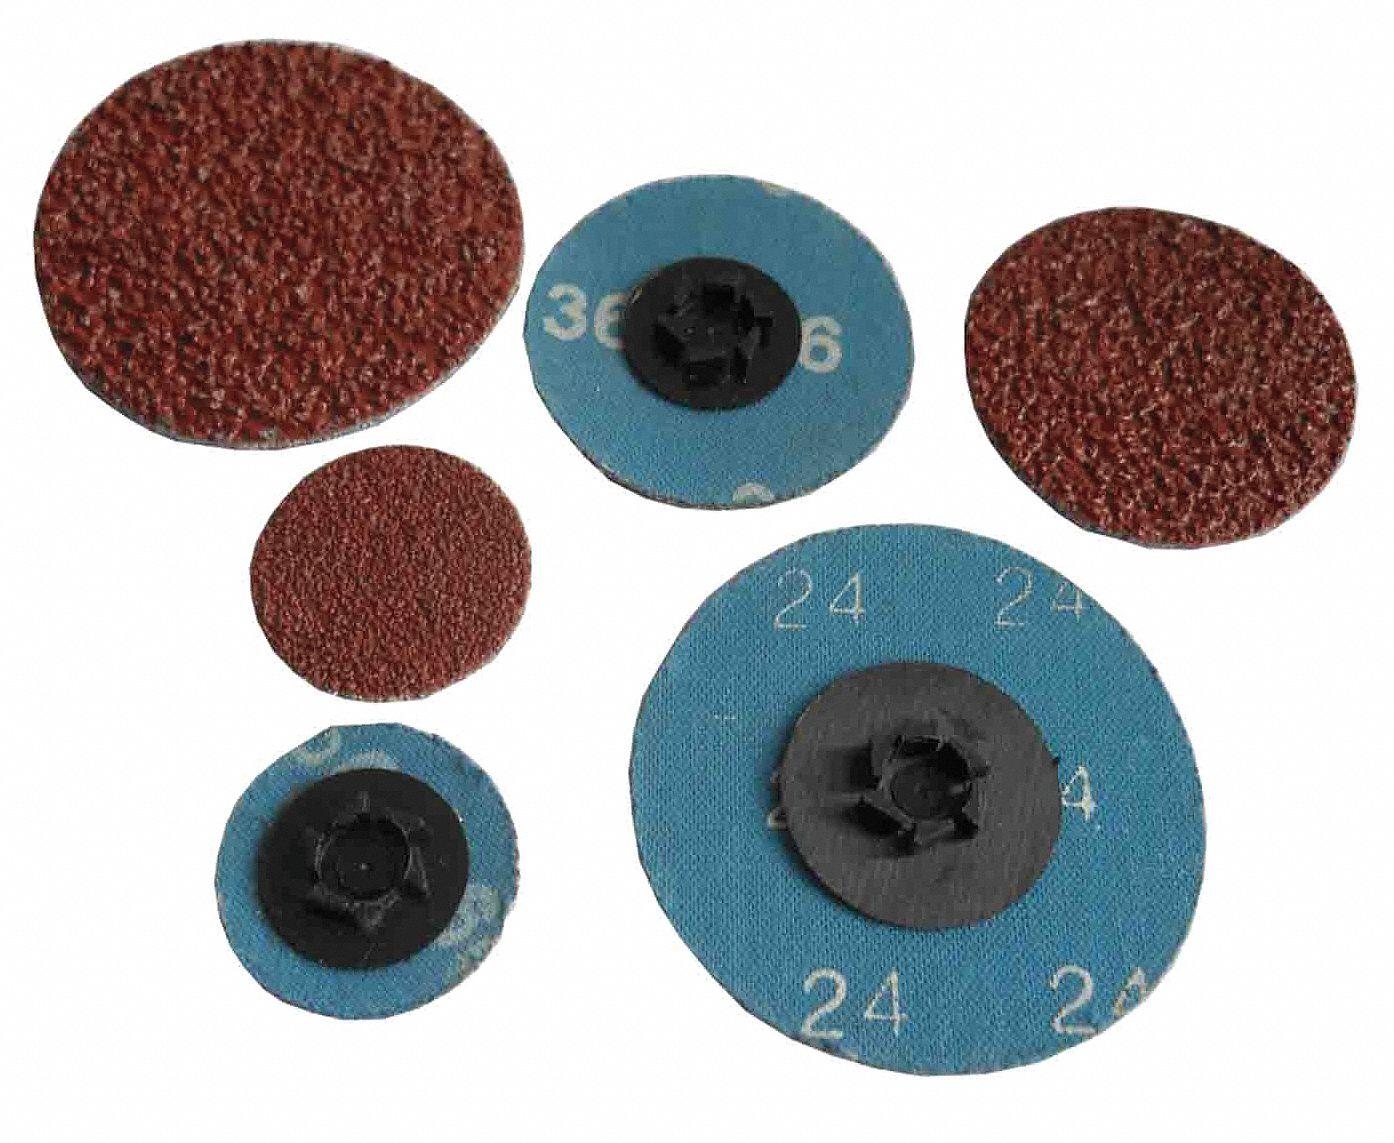 Locking Sanding Discs